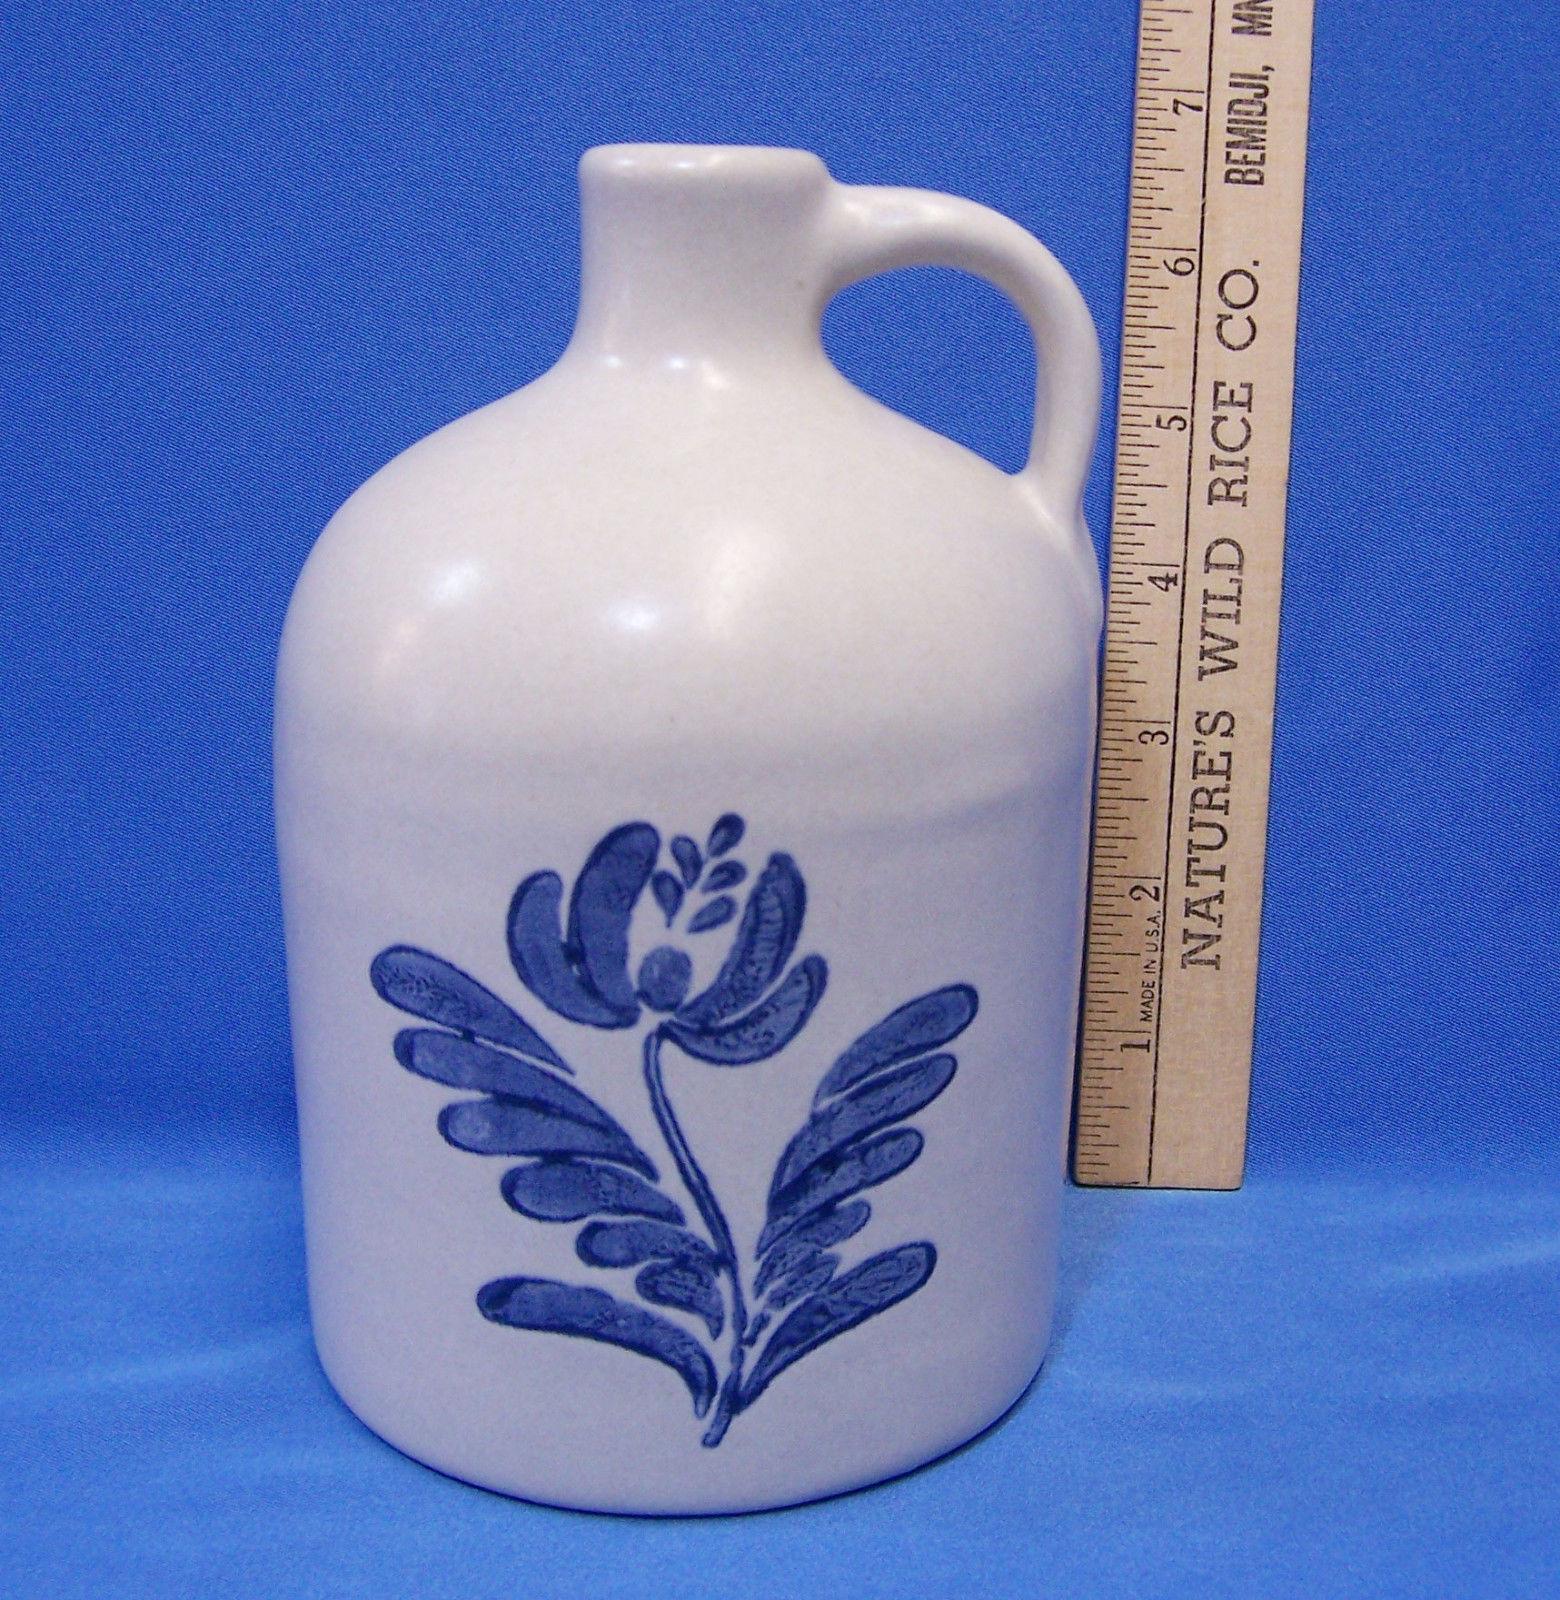 Pfaltzgraff Vase: 8 listings